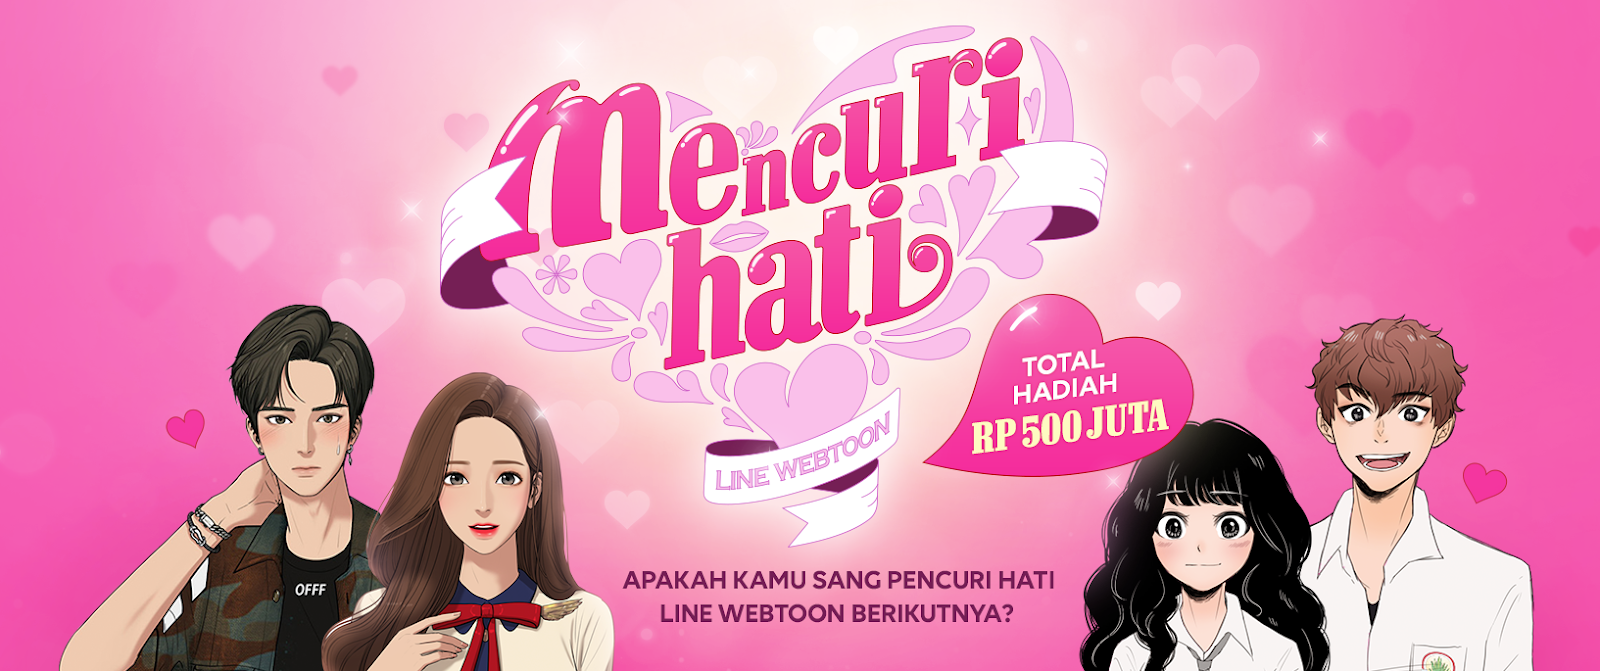 Yuk Ikutan Kontes LINE WEBTOON Dalam Rangka Ulang Tahun KE-5!